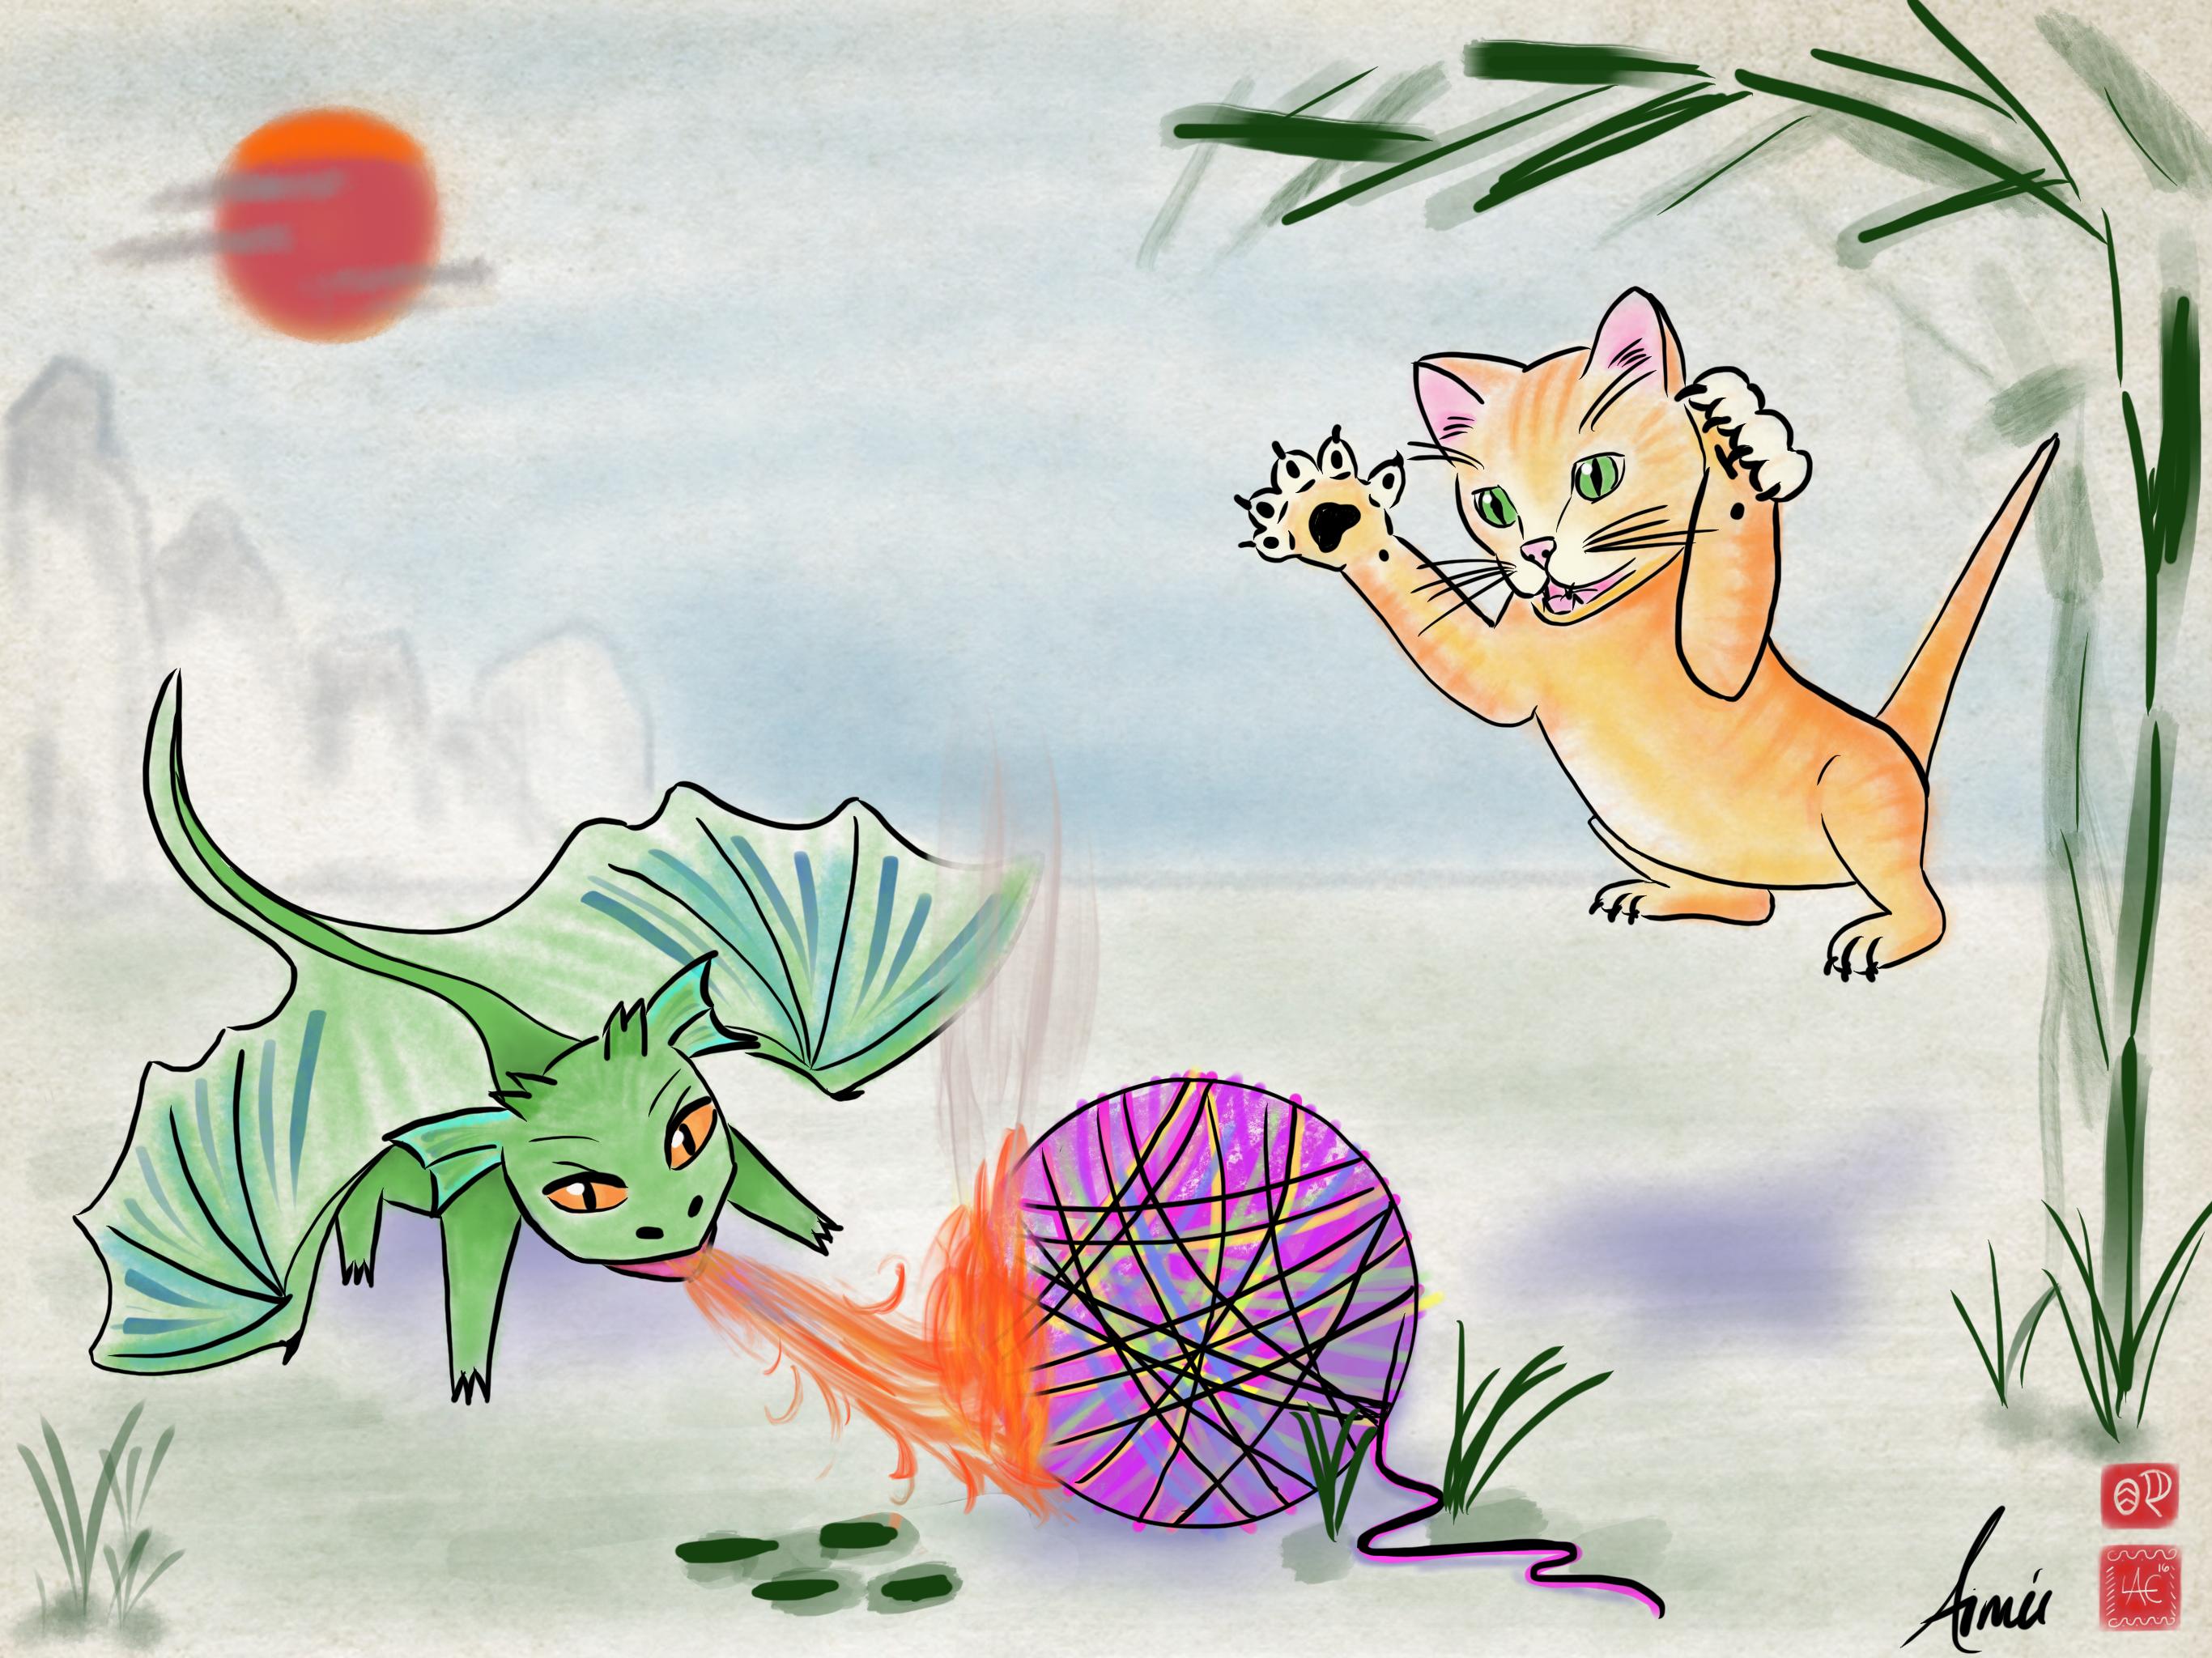 Dragons Vs Kittens Art Challenge by Jazza